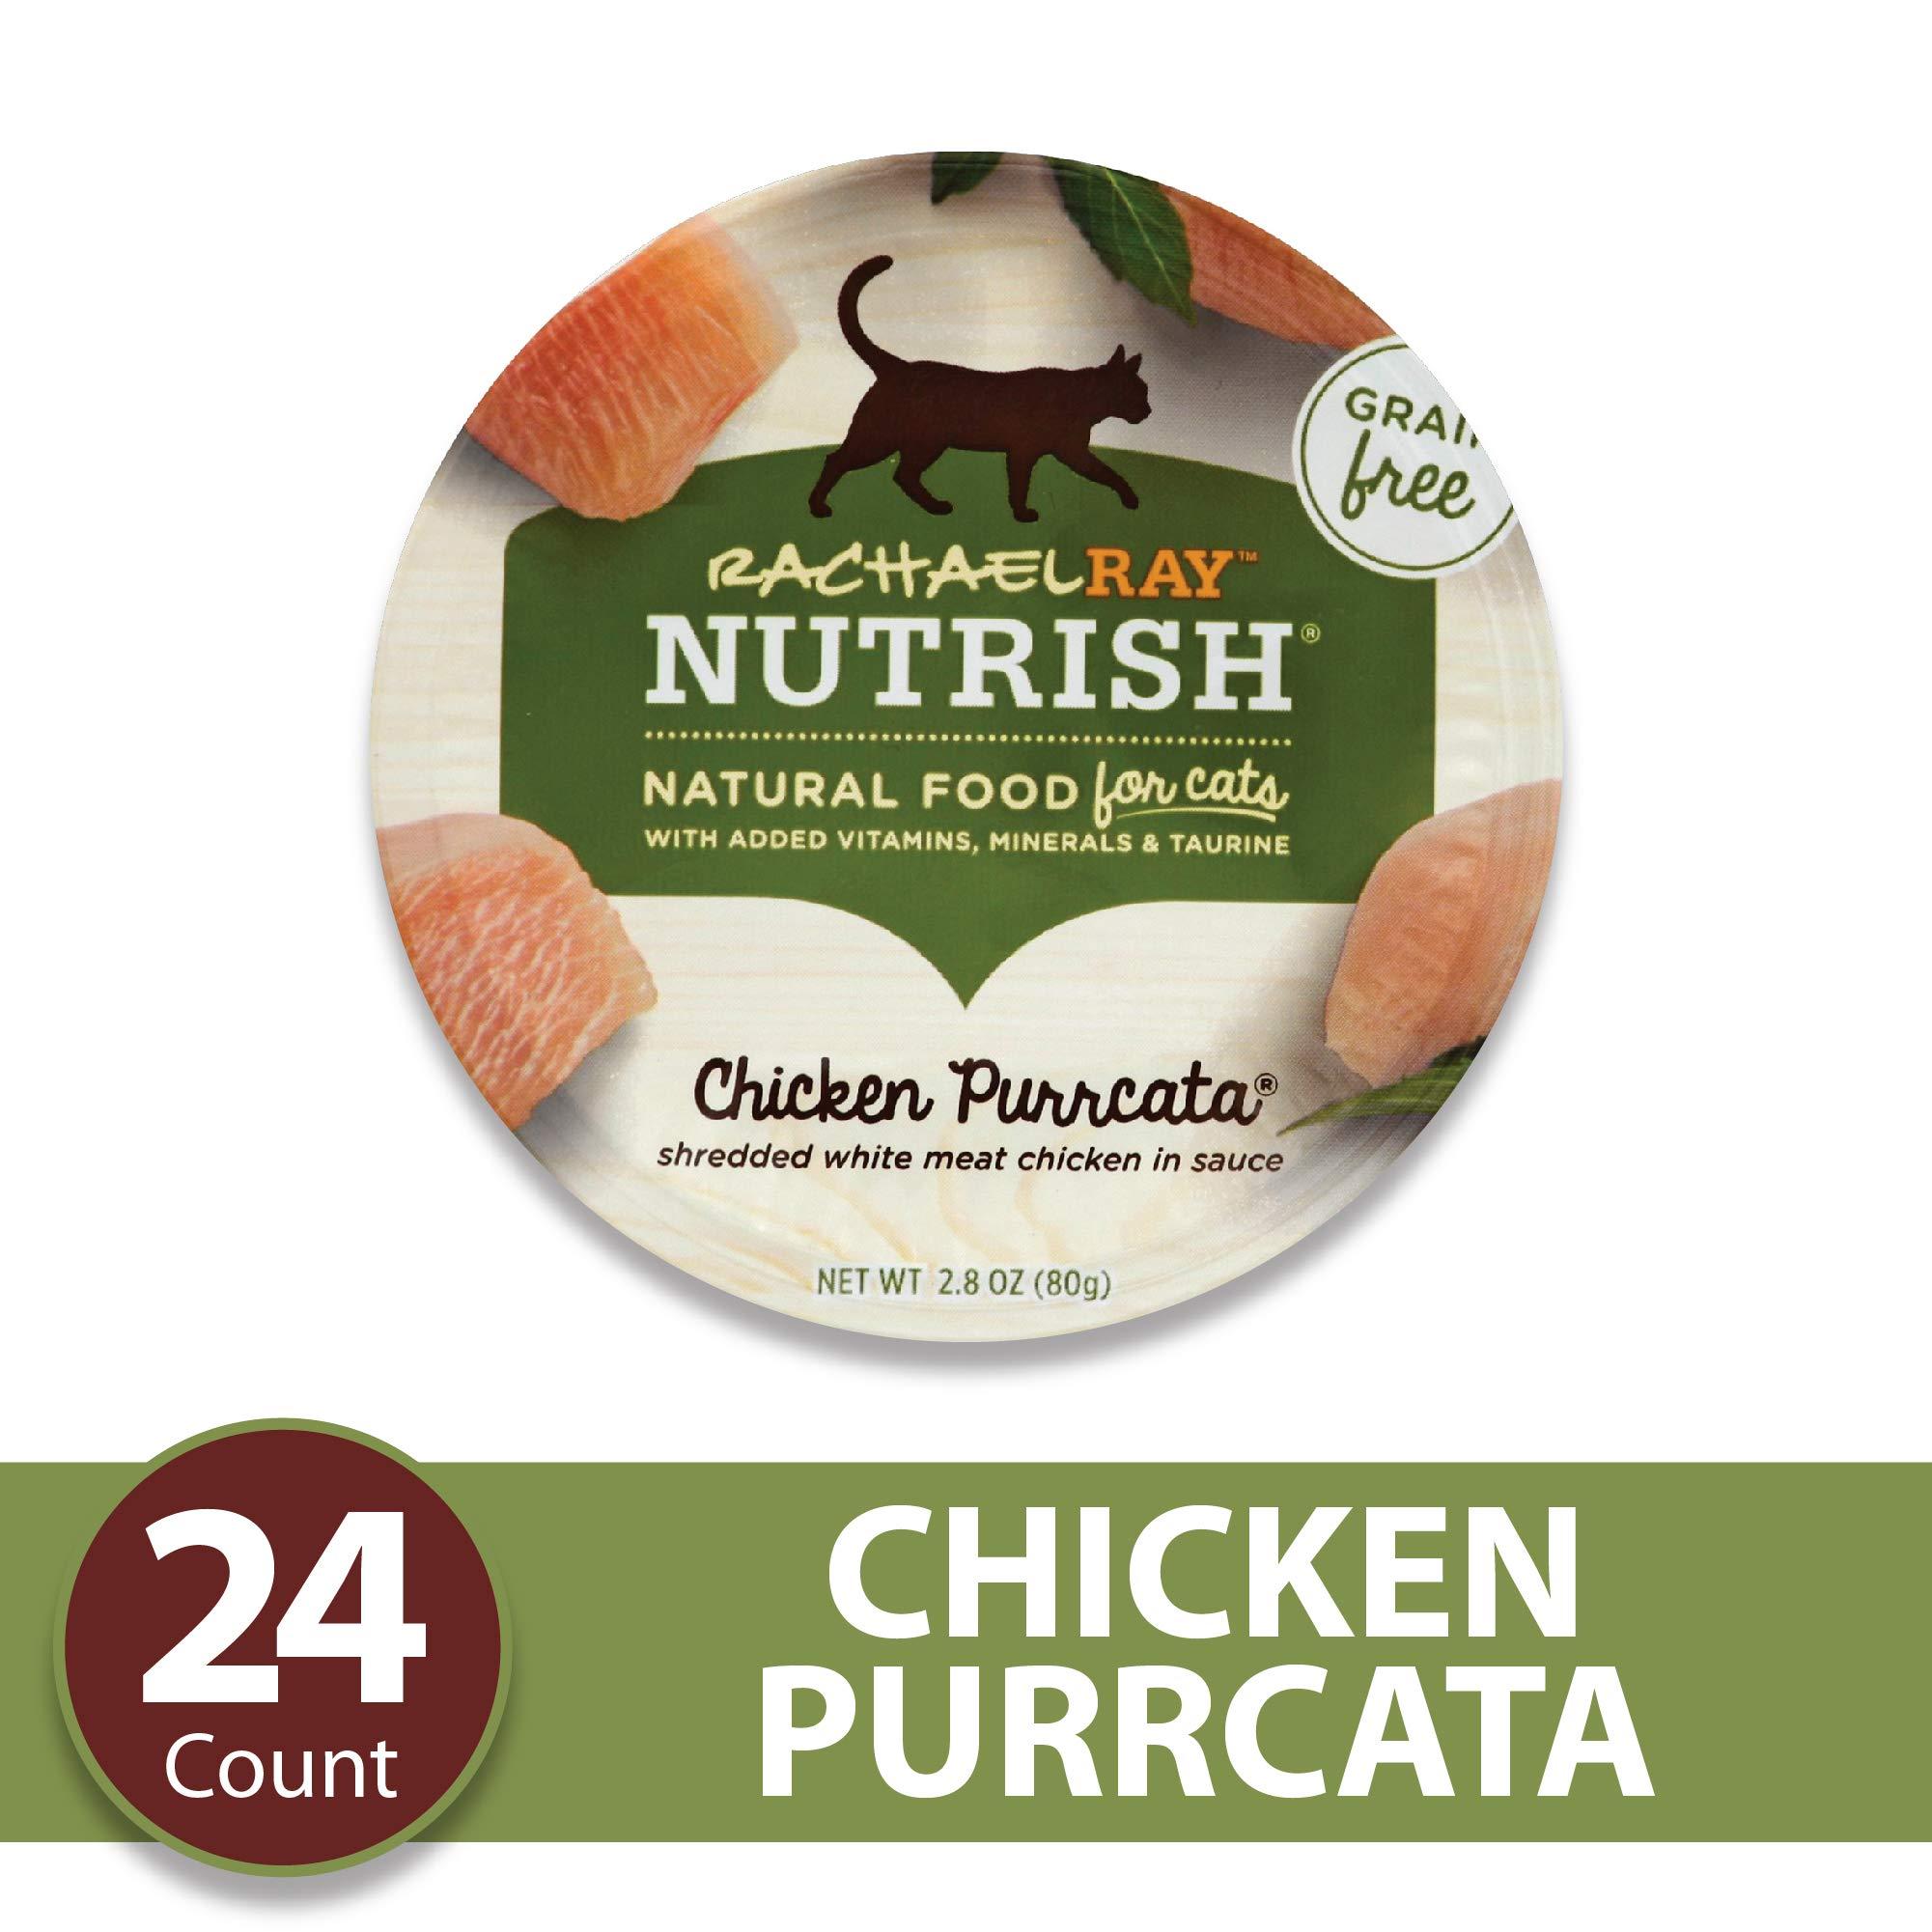 Rachael Ray Nutrish Natural Premium Wet Cat Food, Chicken Purrcata, Grain Free, 2.8 Oz. Tub (Pack Of 24) by Rachael Ray Nutrish